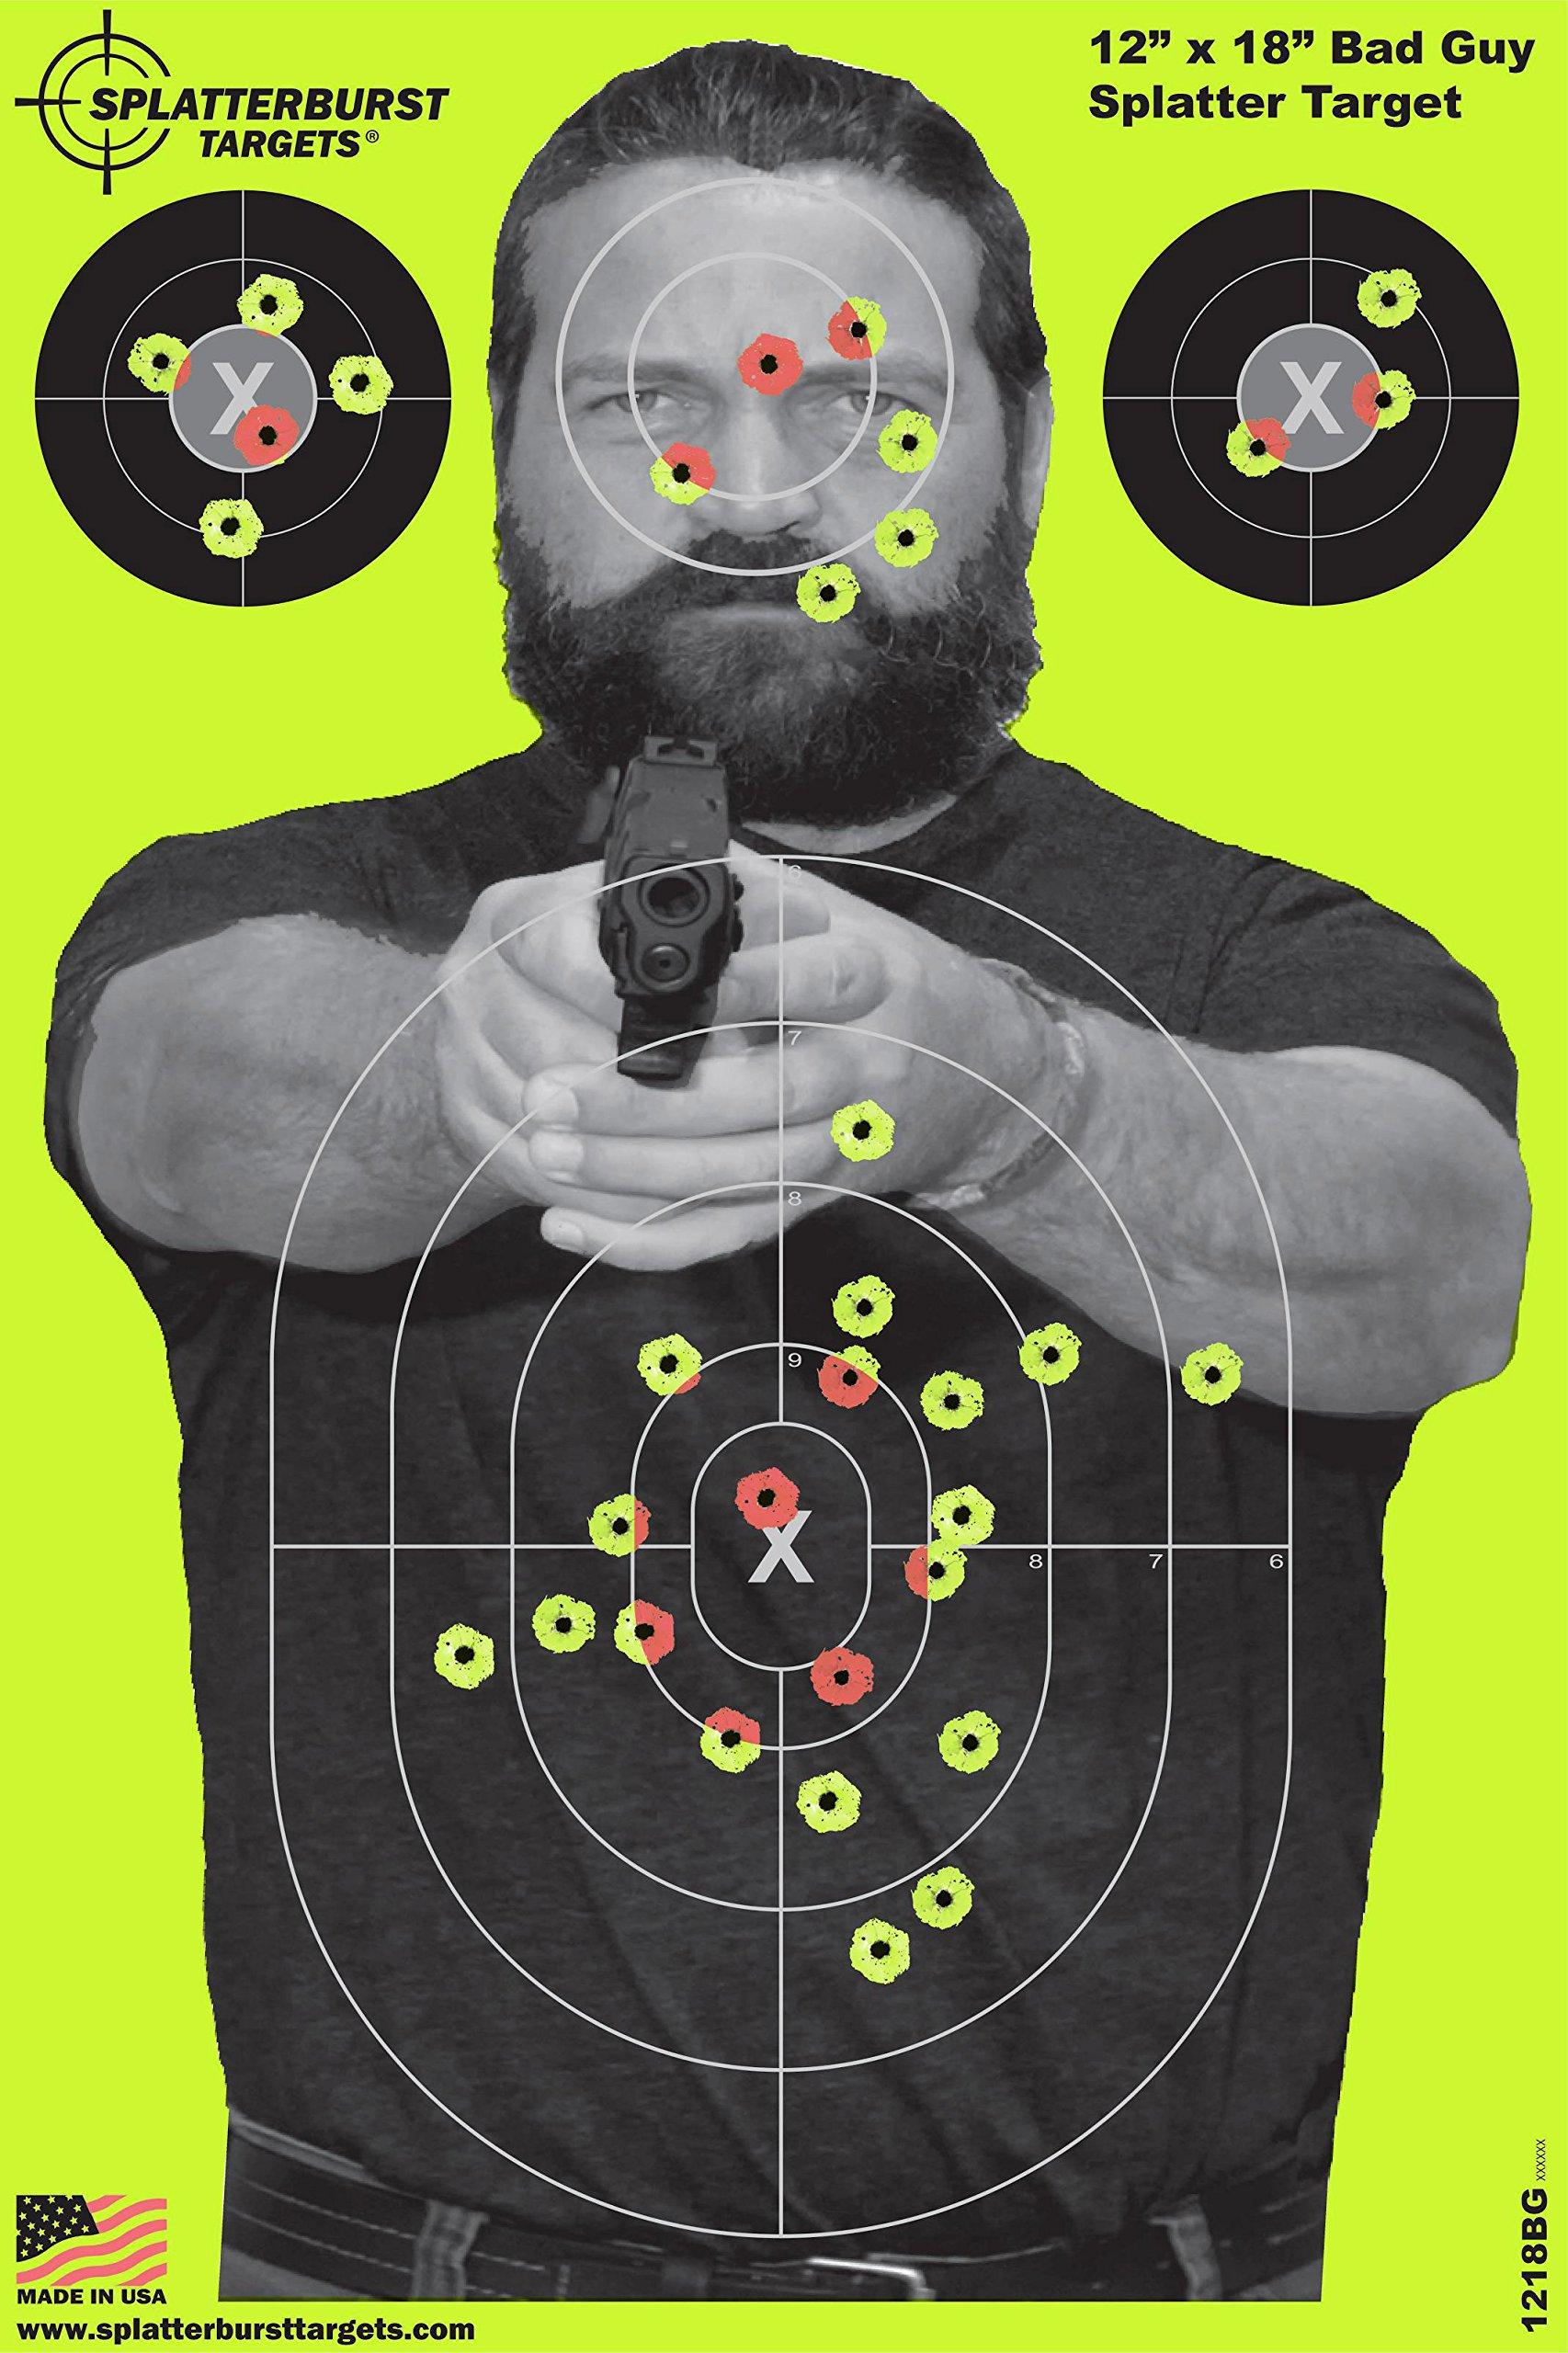 Splatterburst Targets - 12 x18 inch - Bad Guy Reactive Shooting Target - Shots Burst Bright Fluorescent Yellow Upon Impact - Gun - Rifle - Pistol - Airsoft - BB Gun - Air Rifle (50 Pack)